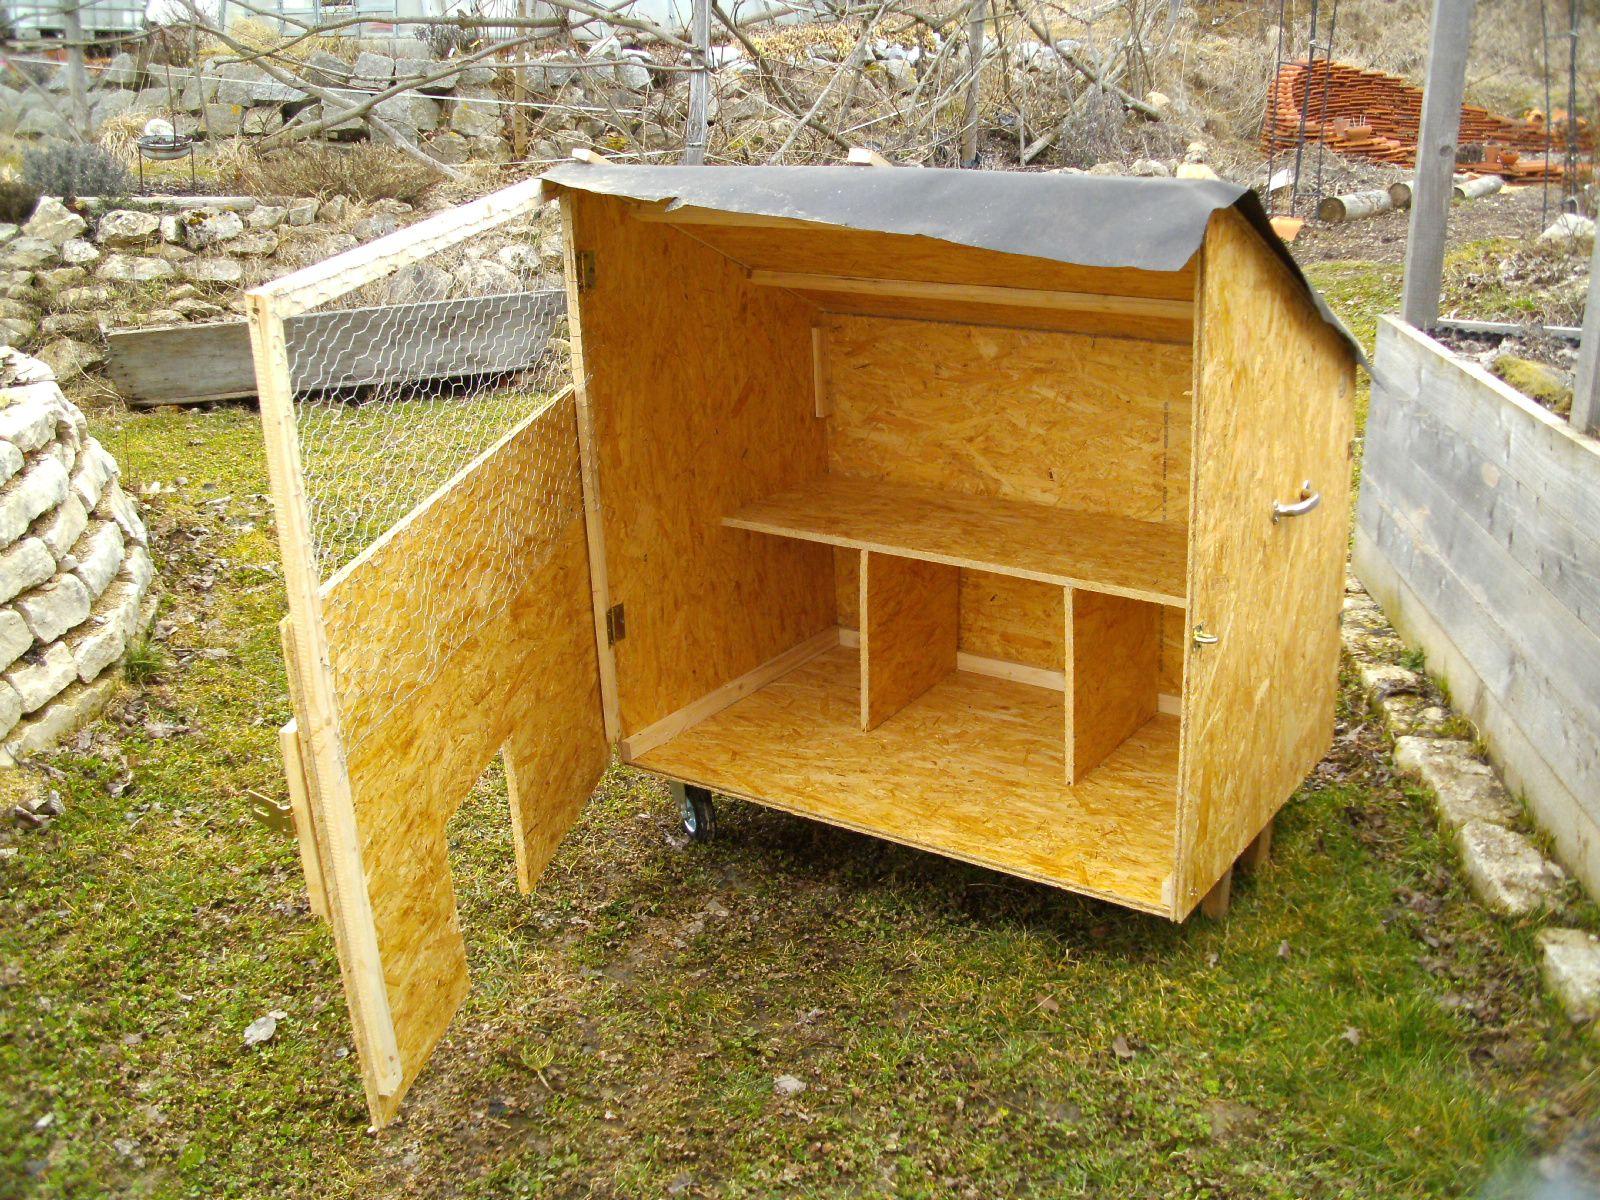 mobiler h hnerstall haus pinterest h hnerstall mobiler h hnerstall und h hner. Black Bedroom Furniture Sets. Home Design Ideas